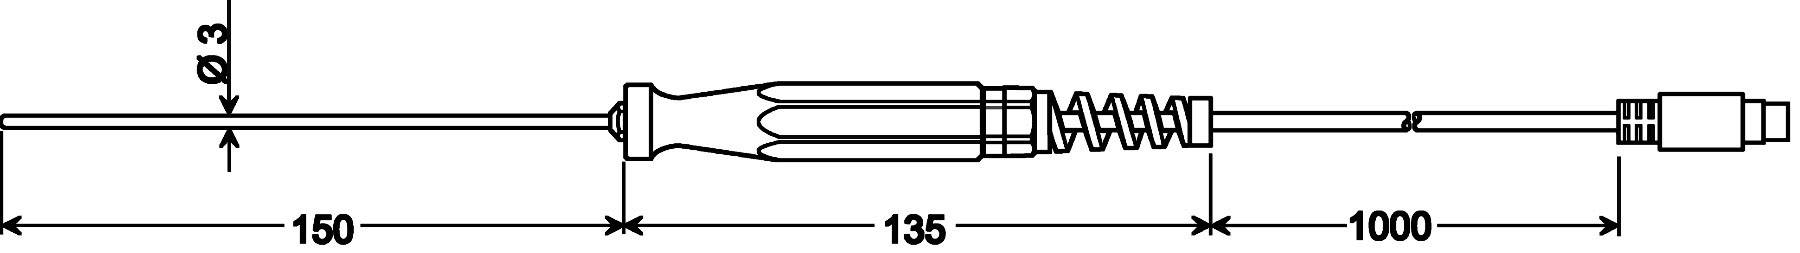 Teplotné čidlo Greisinger GTF 401 1/3DIN, Pt100, -50 až +400 °C